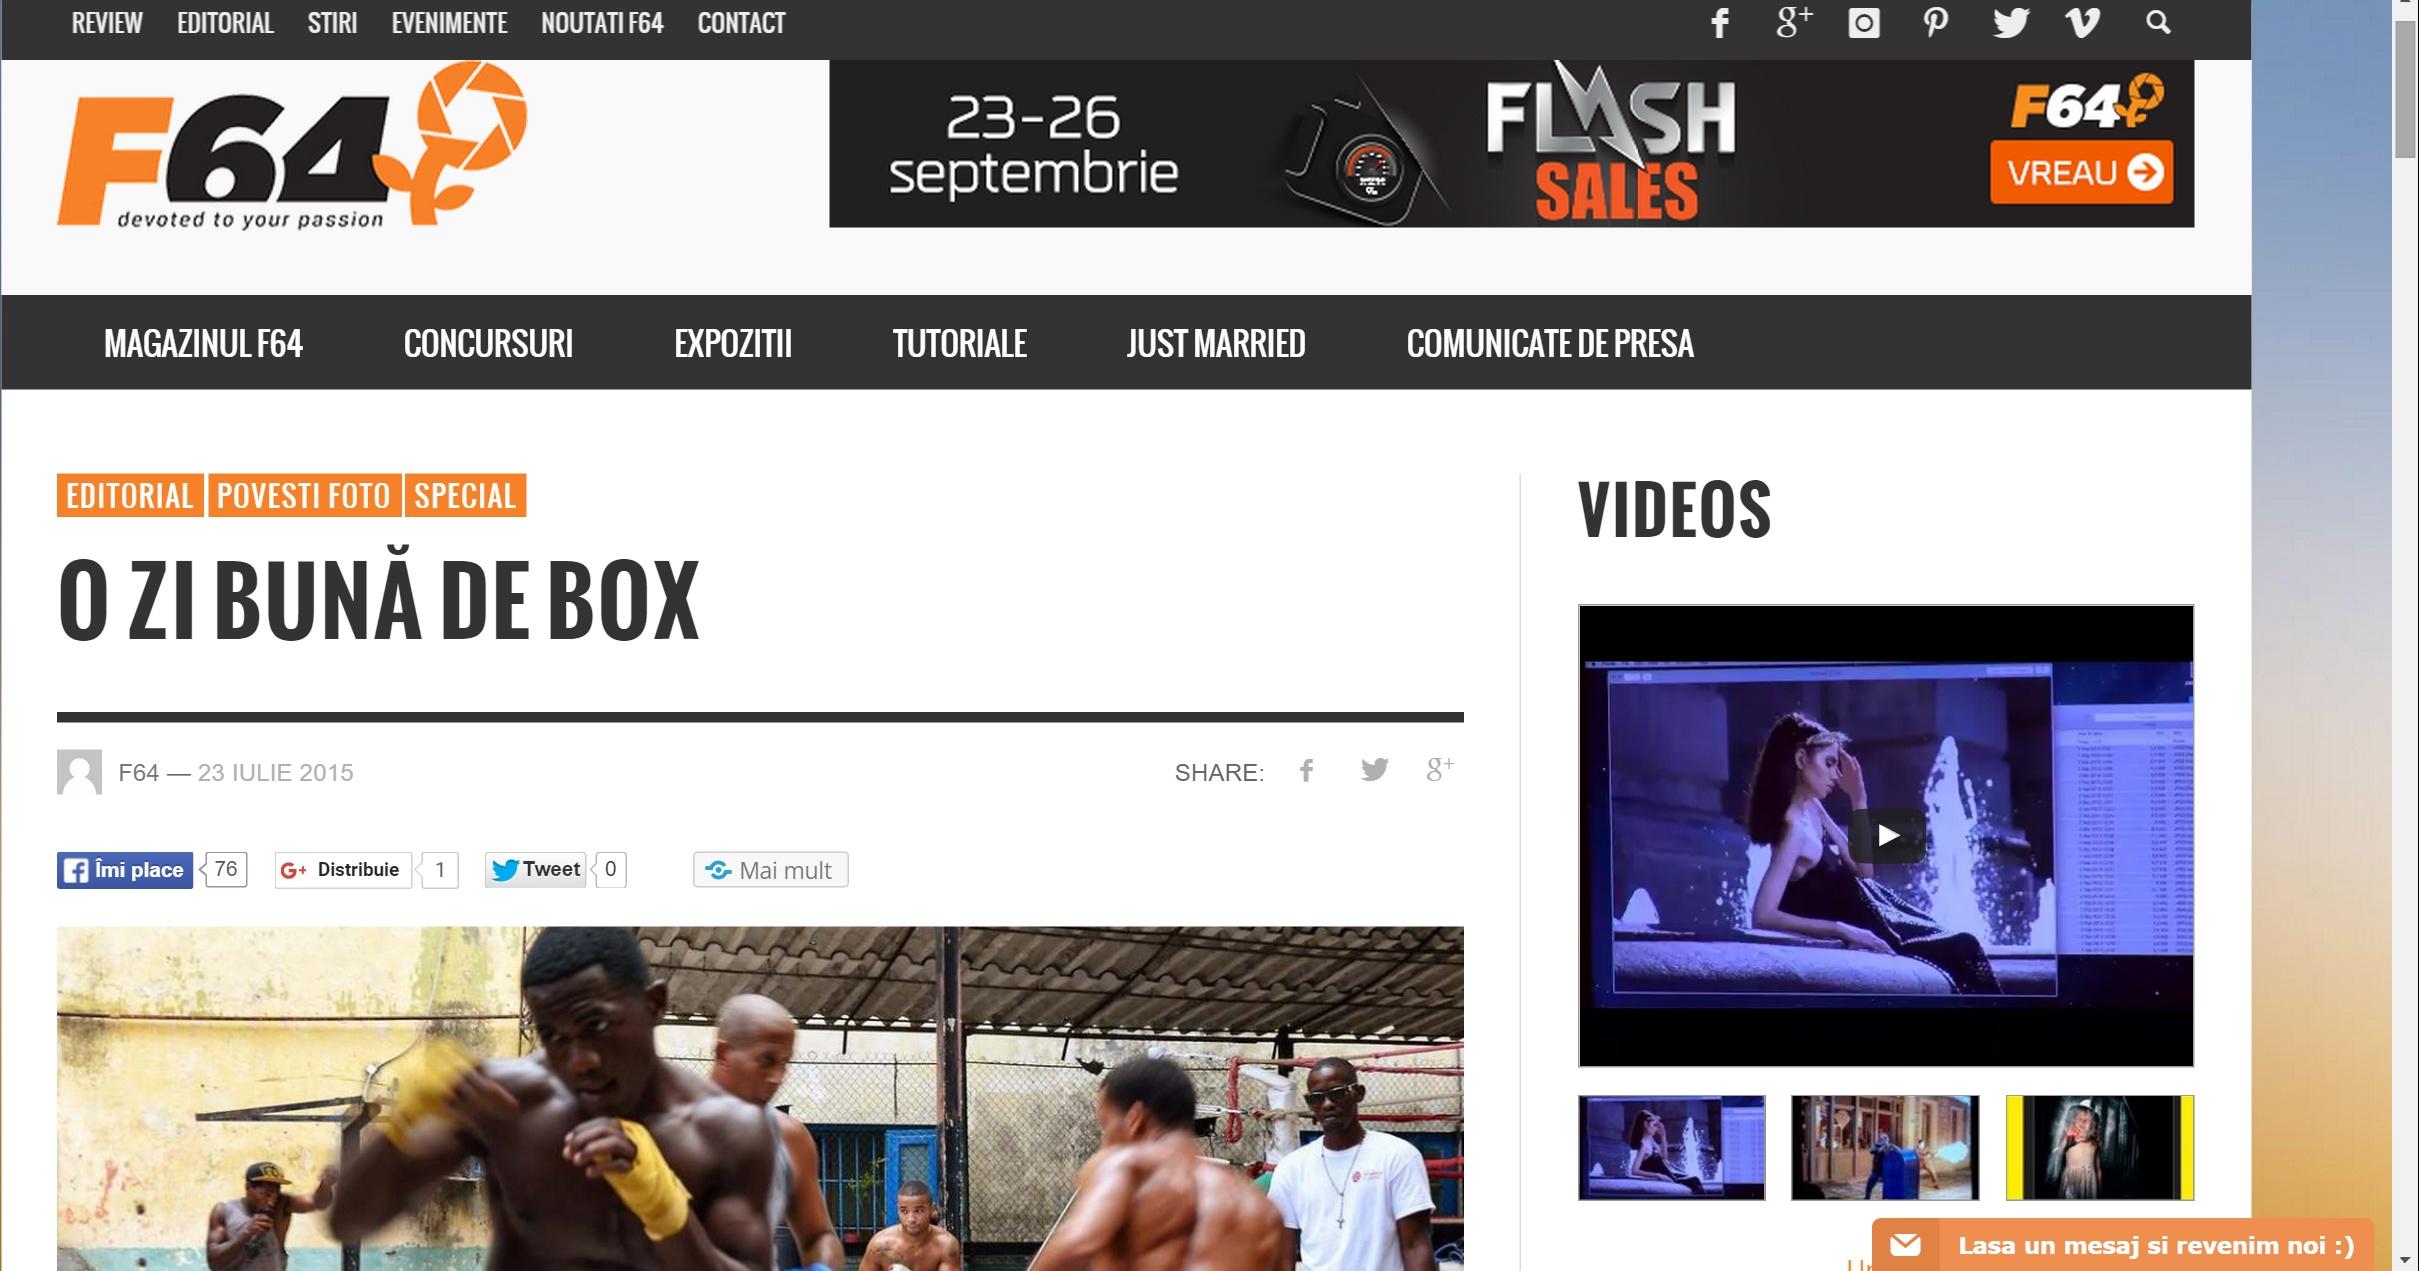 O zi buna de box, F64 blog, 2015